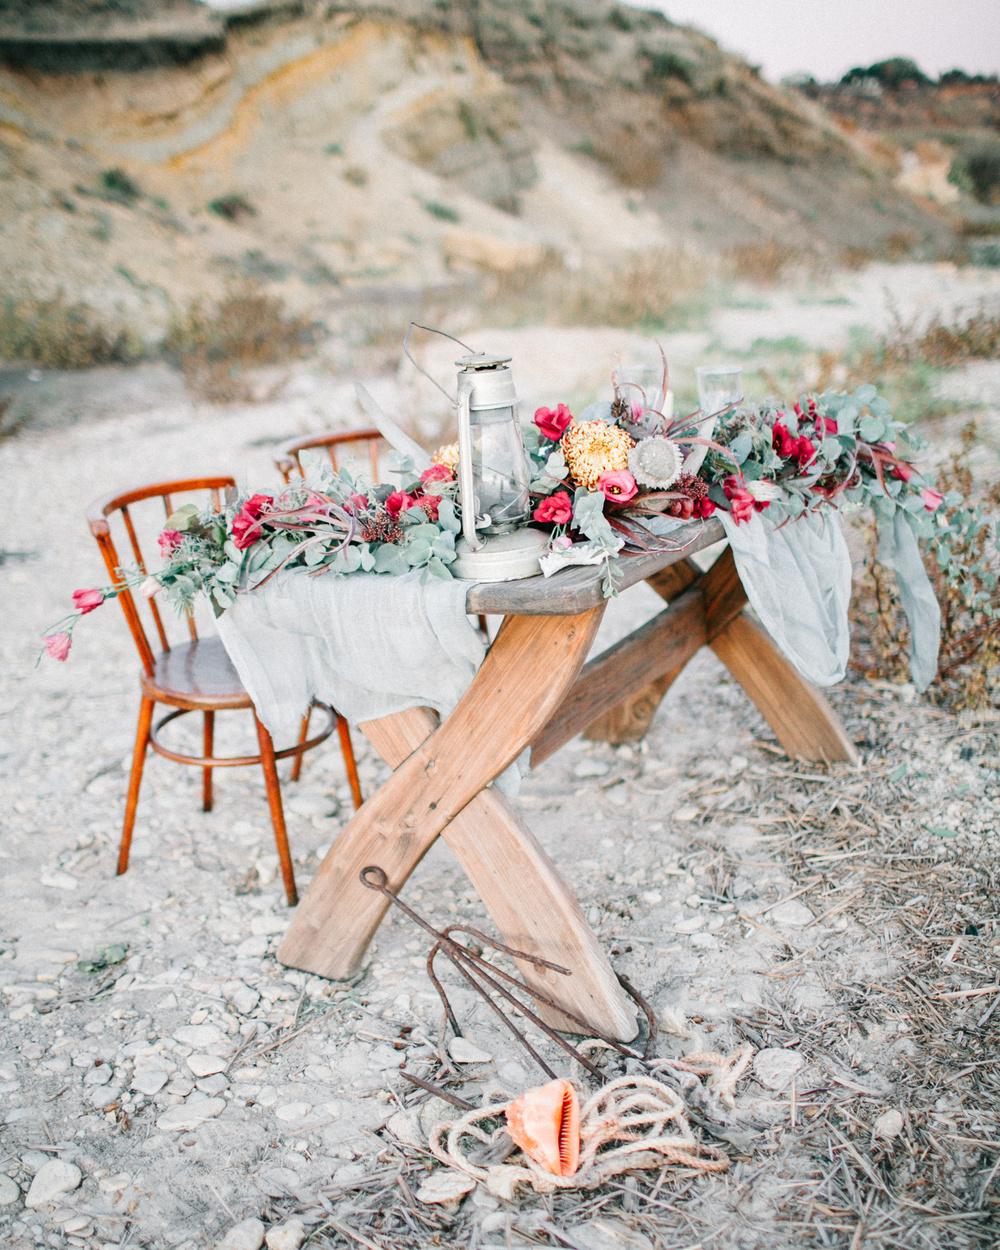 Lovely wedding table decor